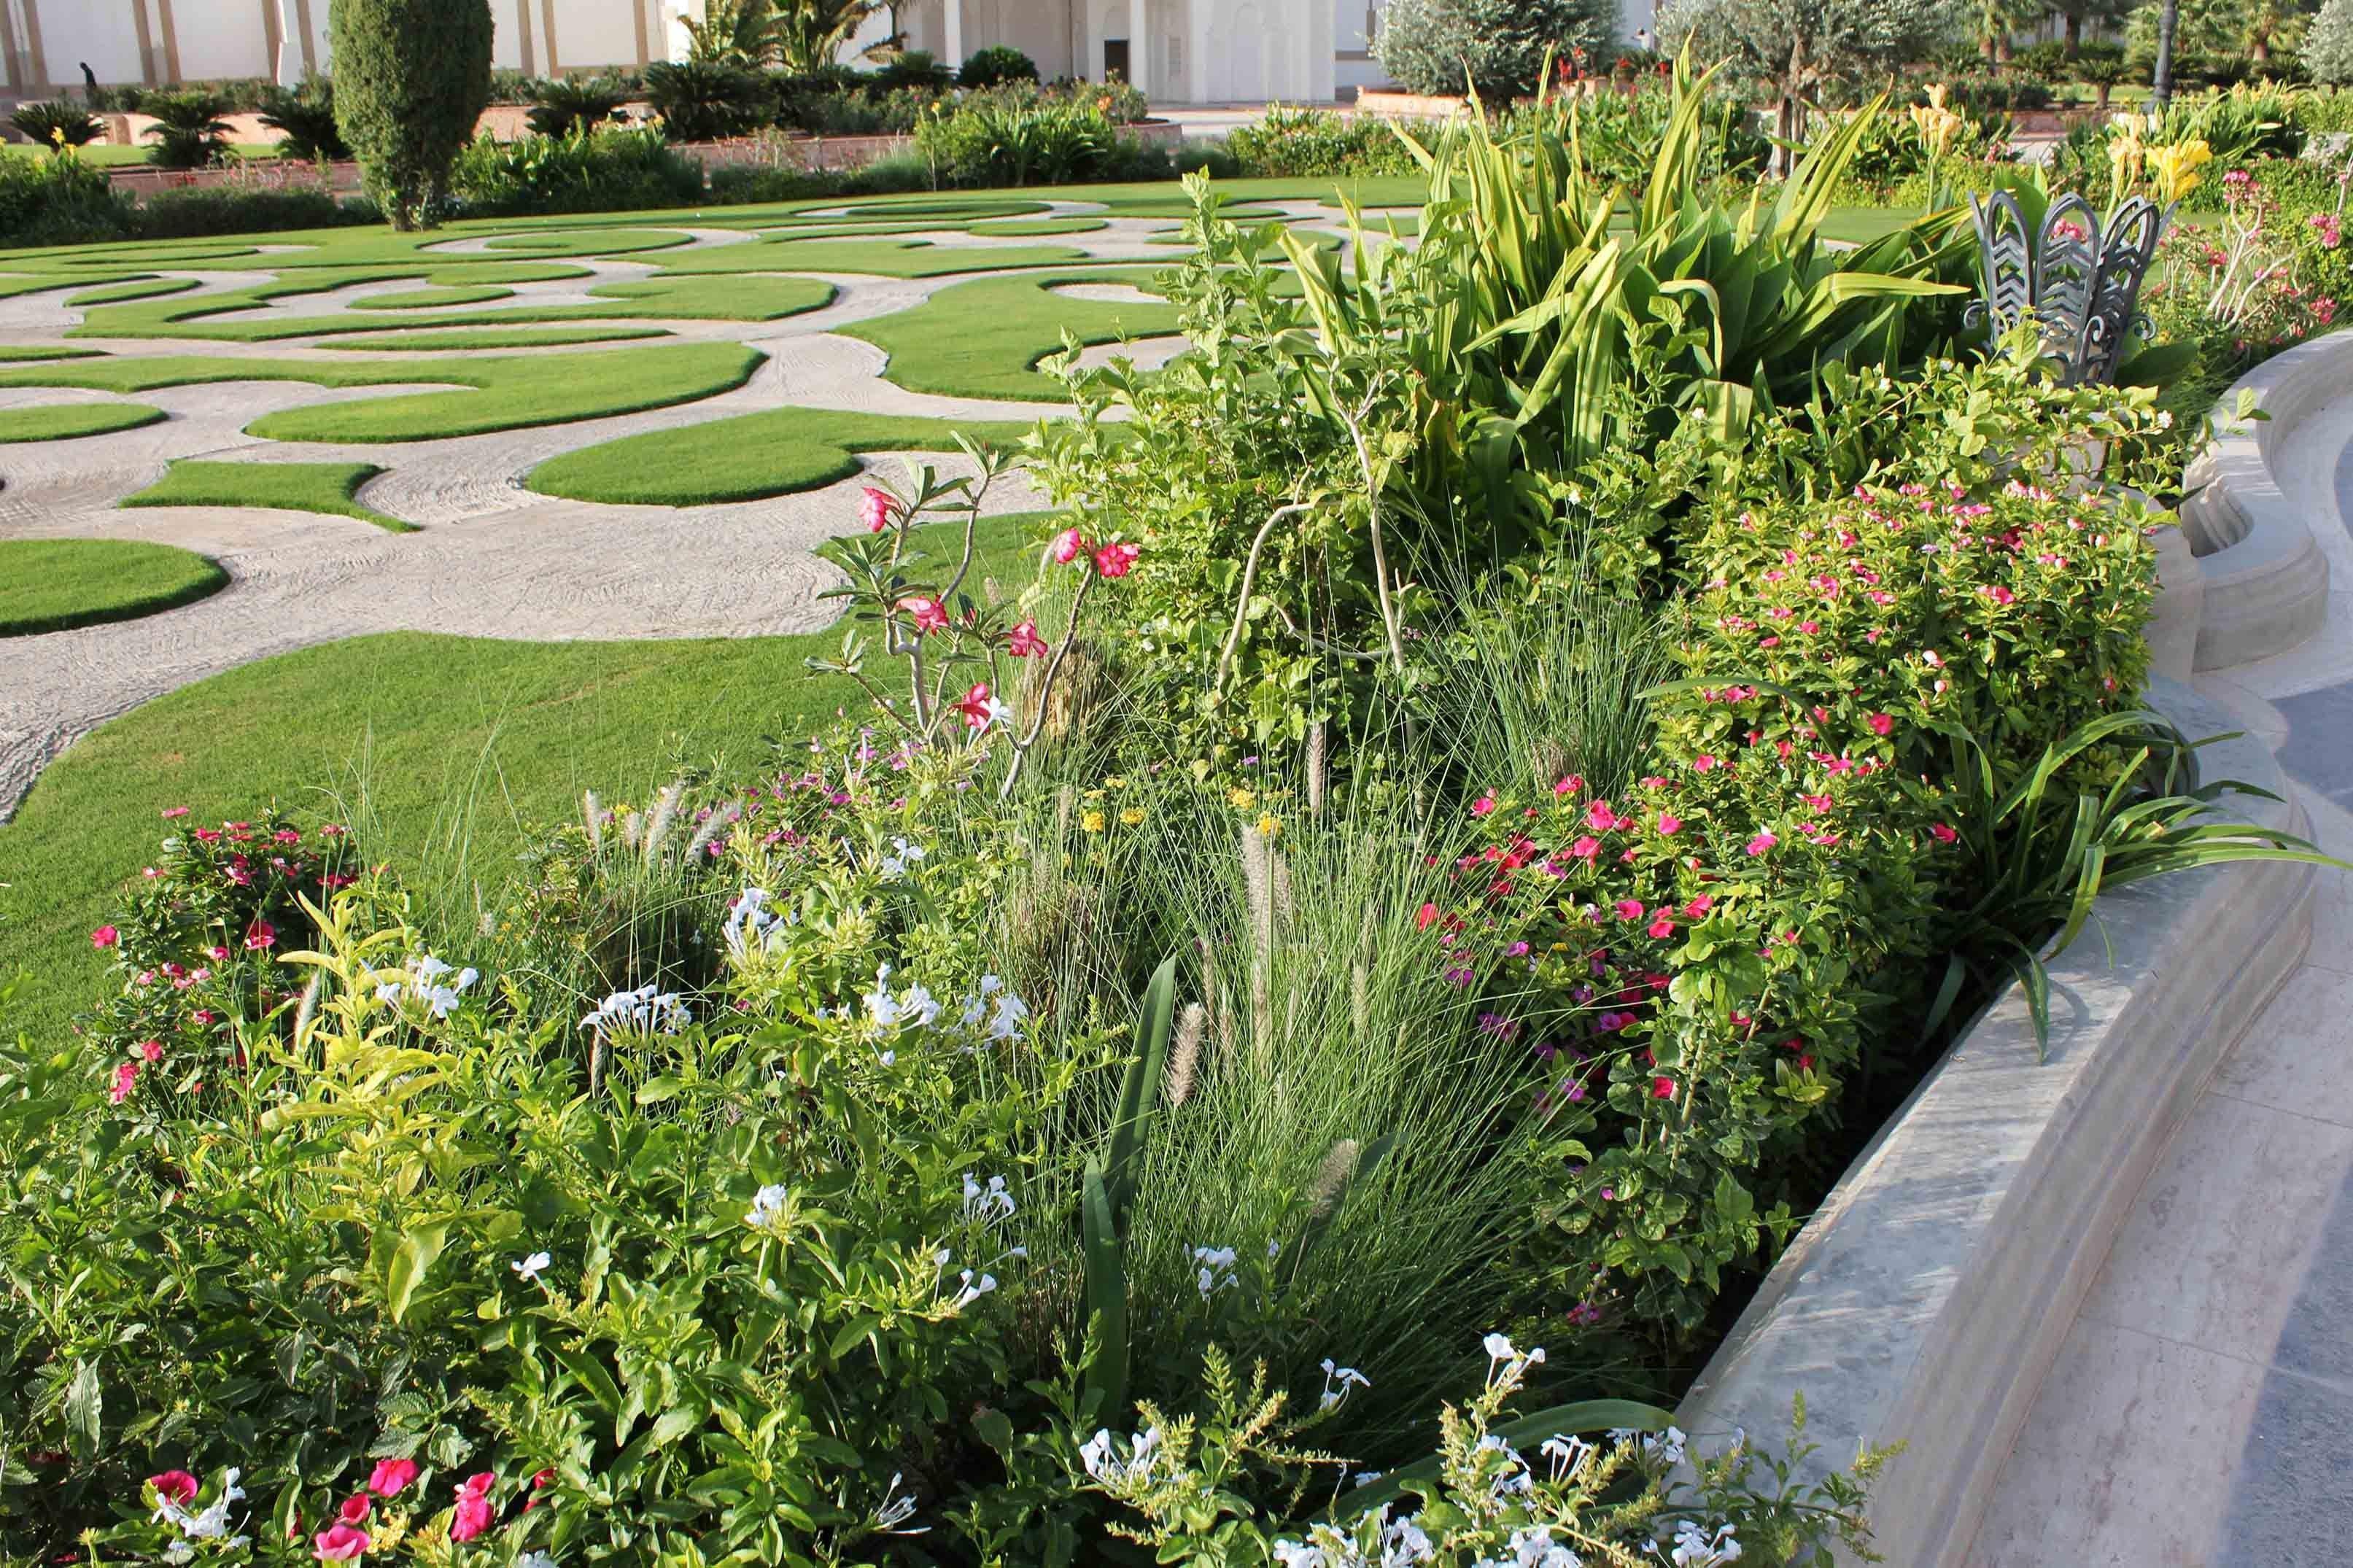 Qatar Green Vegetable Garden Garden Design Beautiful Gardens Easy Garden